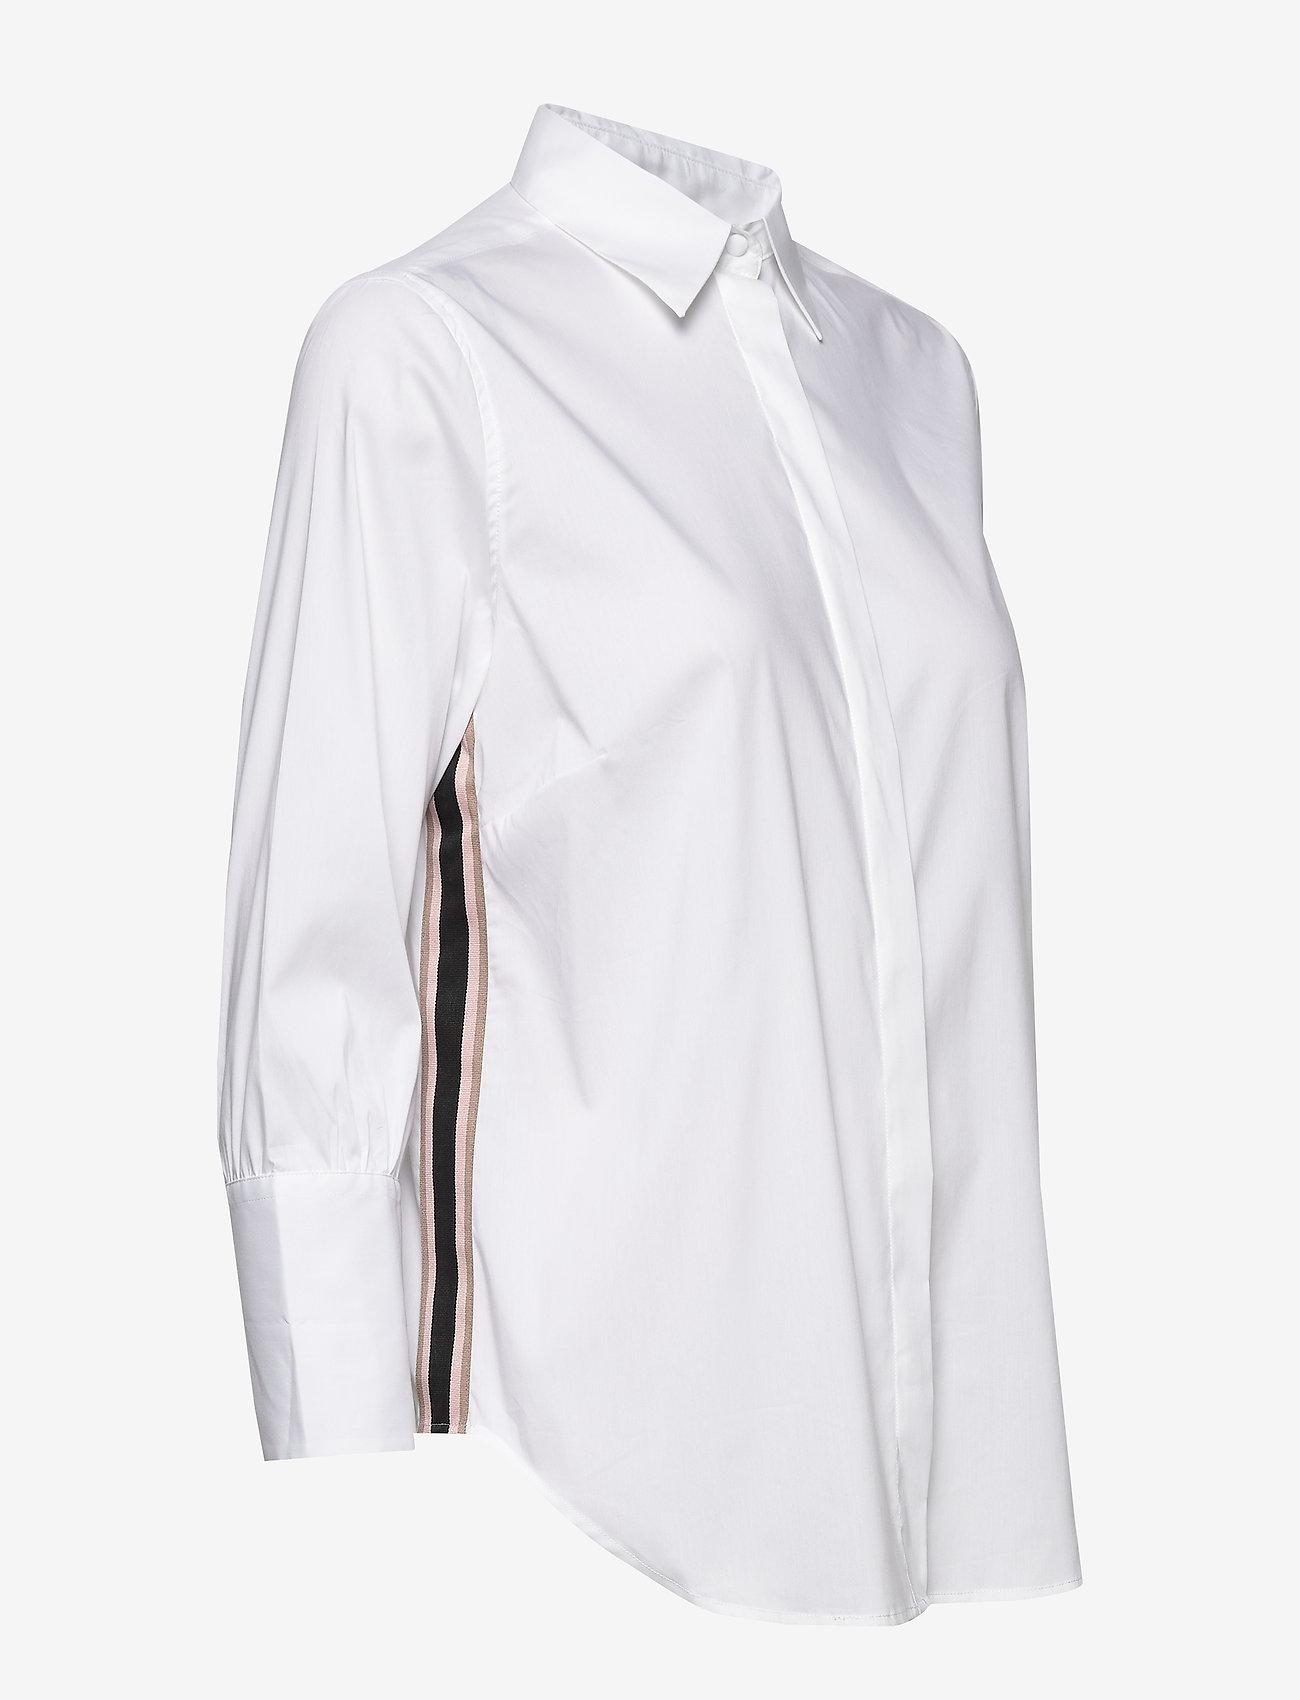 MOS MOSH Larina Ribbon Shirt 7/8 - Blouses & Shirts WHITE